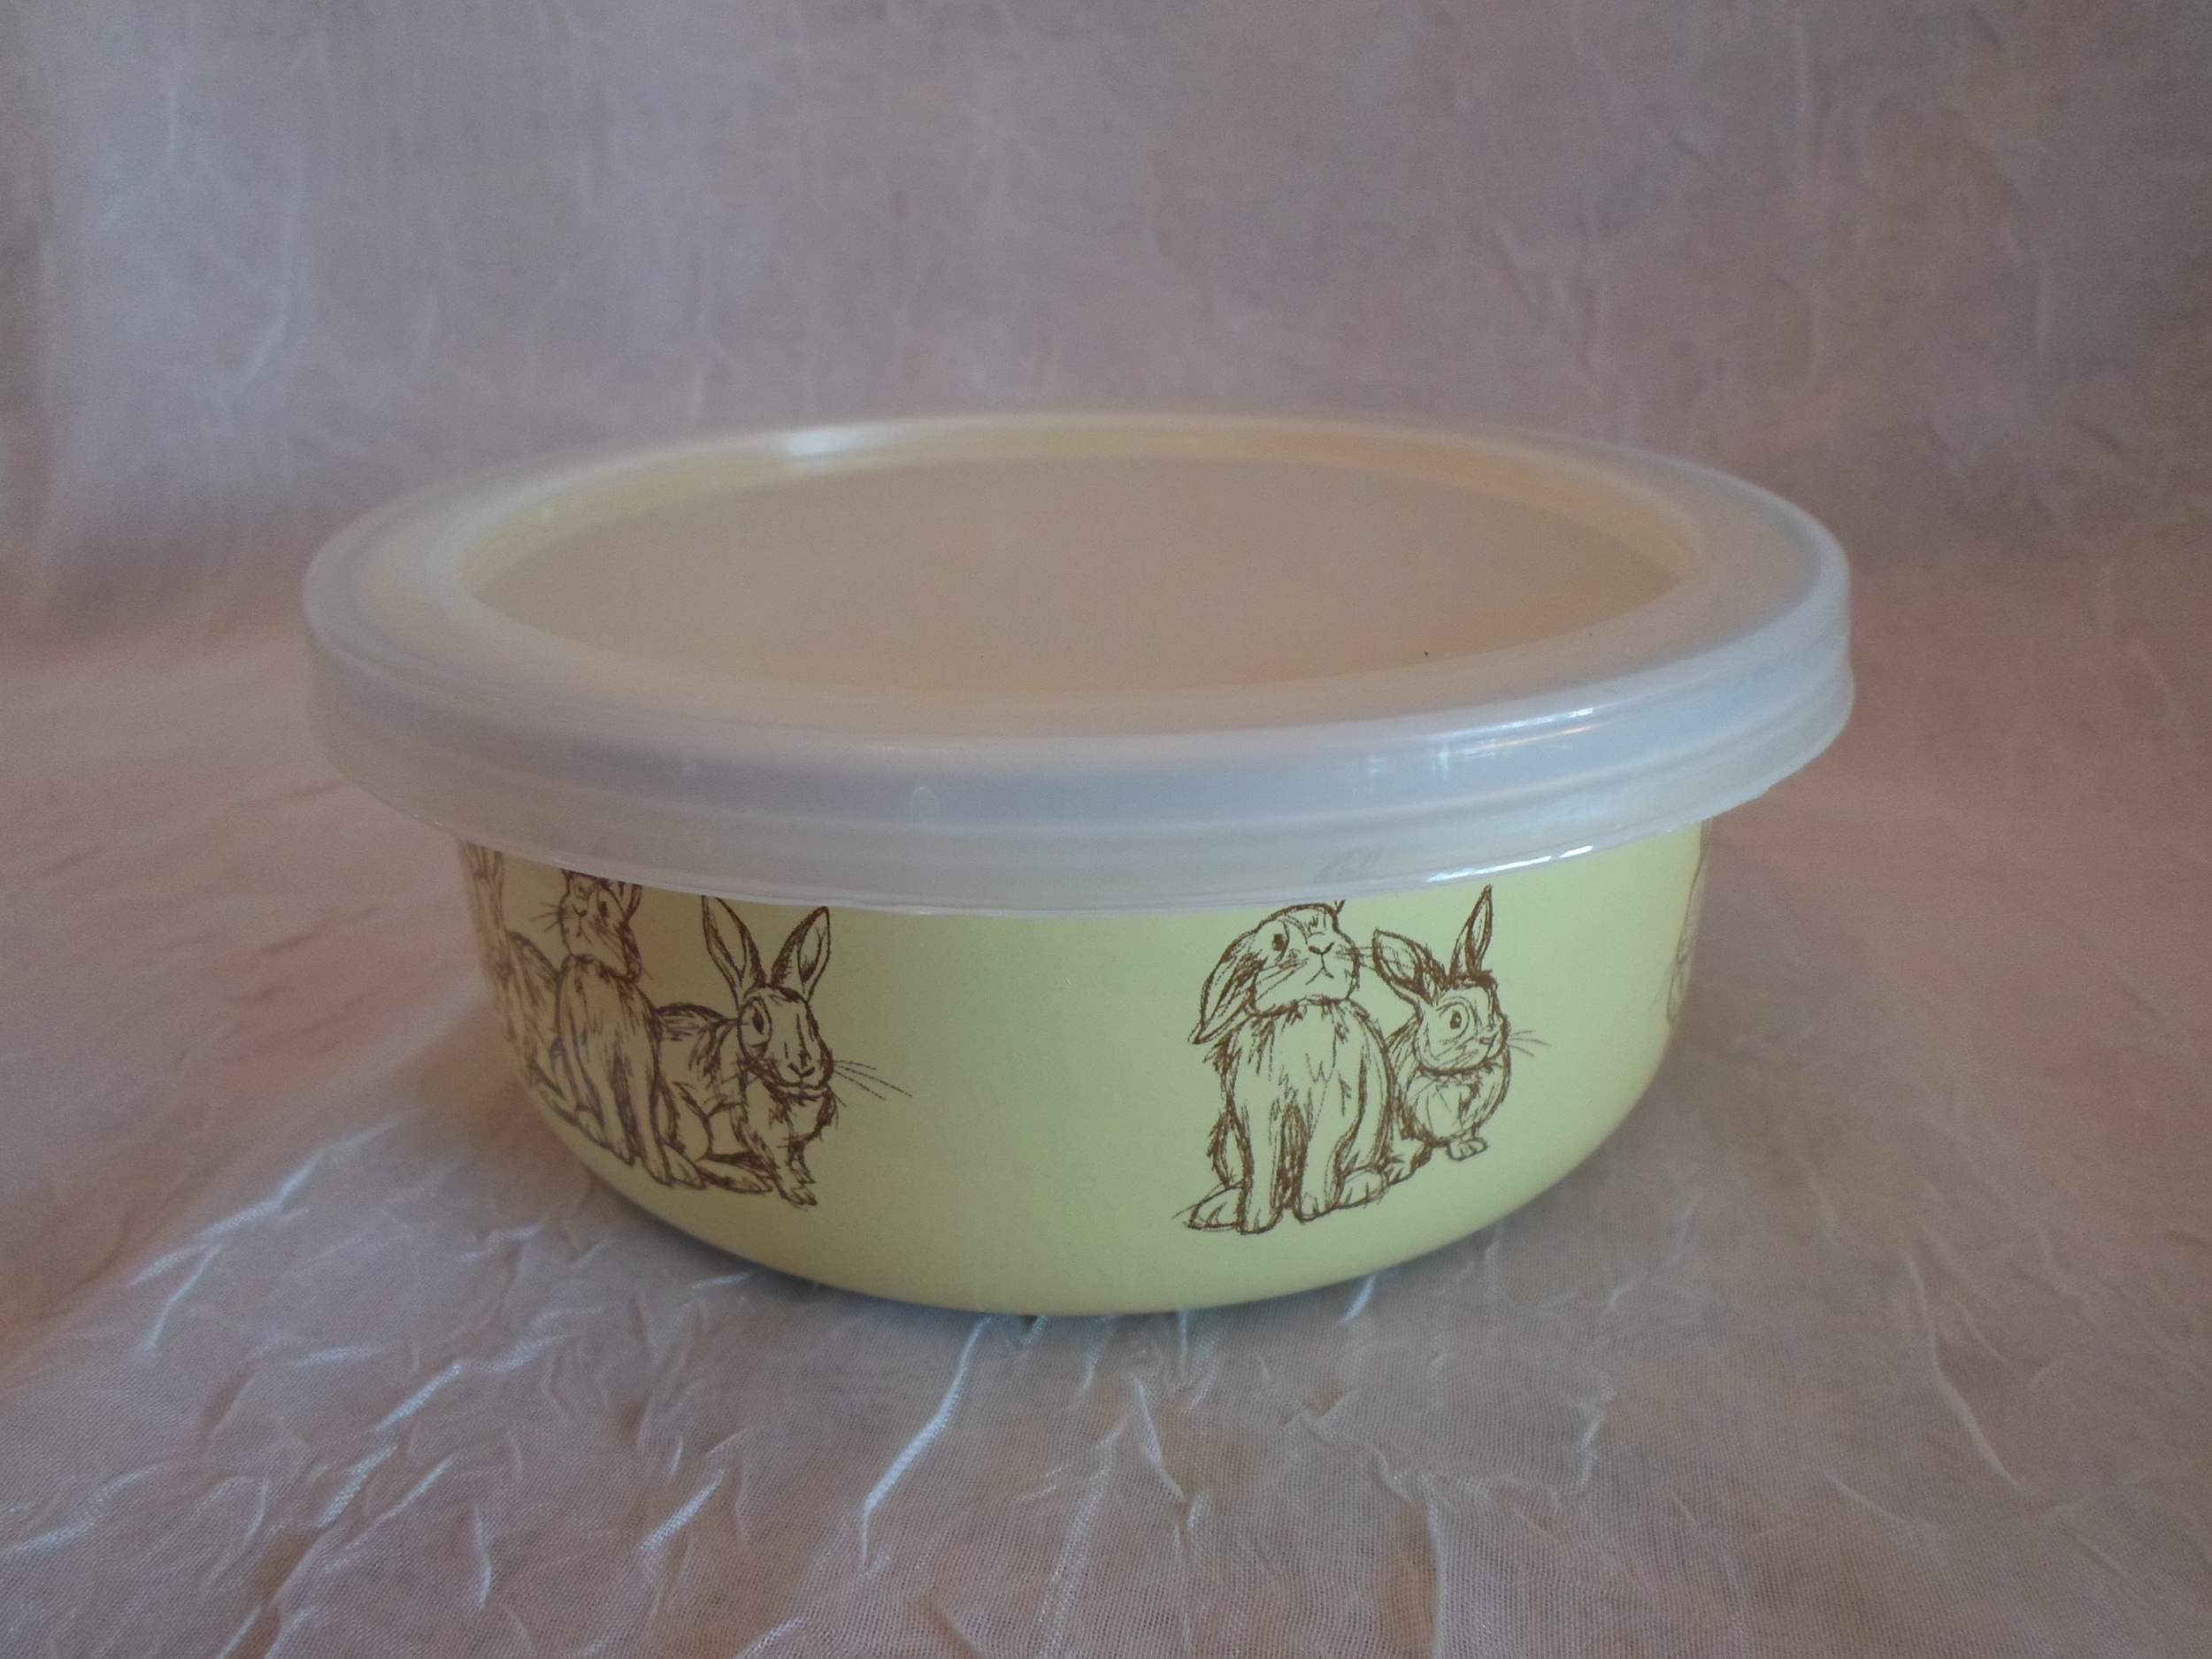 Enamelware Yellow Bunny Bowl   w/ Lid    $9.95    Wants 1 PURCHASED